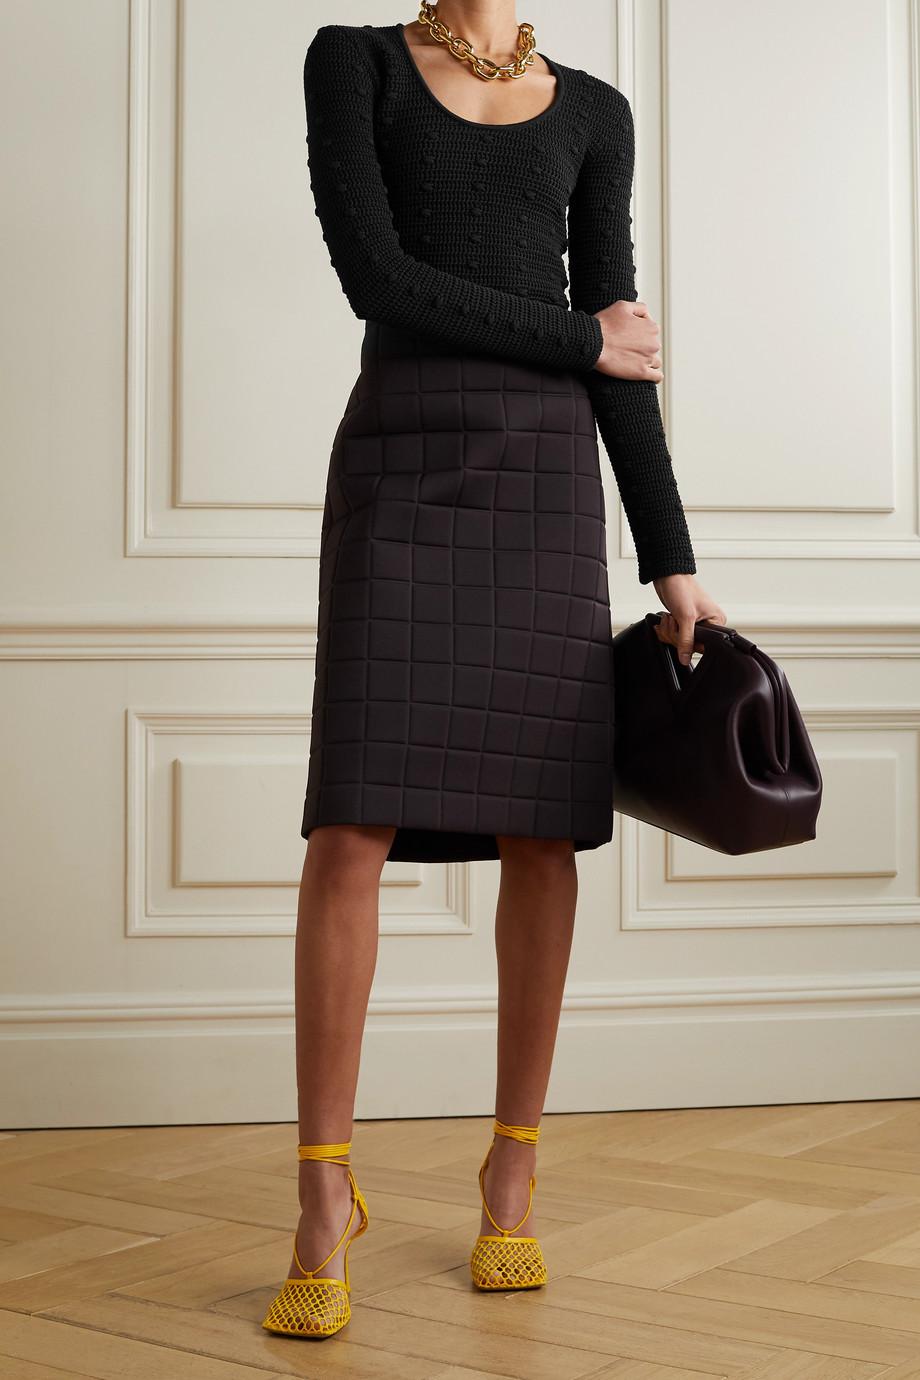 Bottega Veneta Gehäkelter Pullover aus Baumwolle